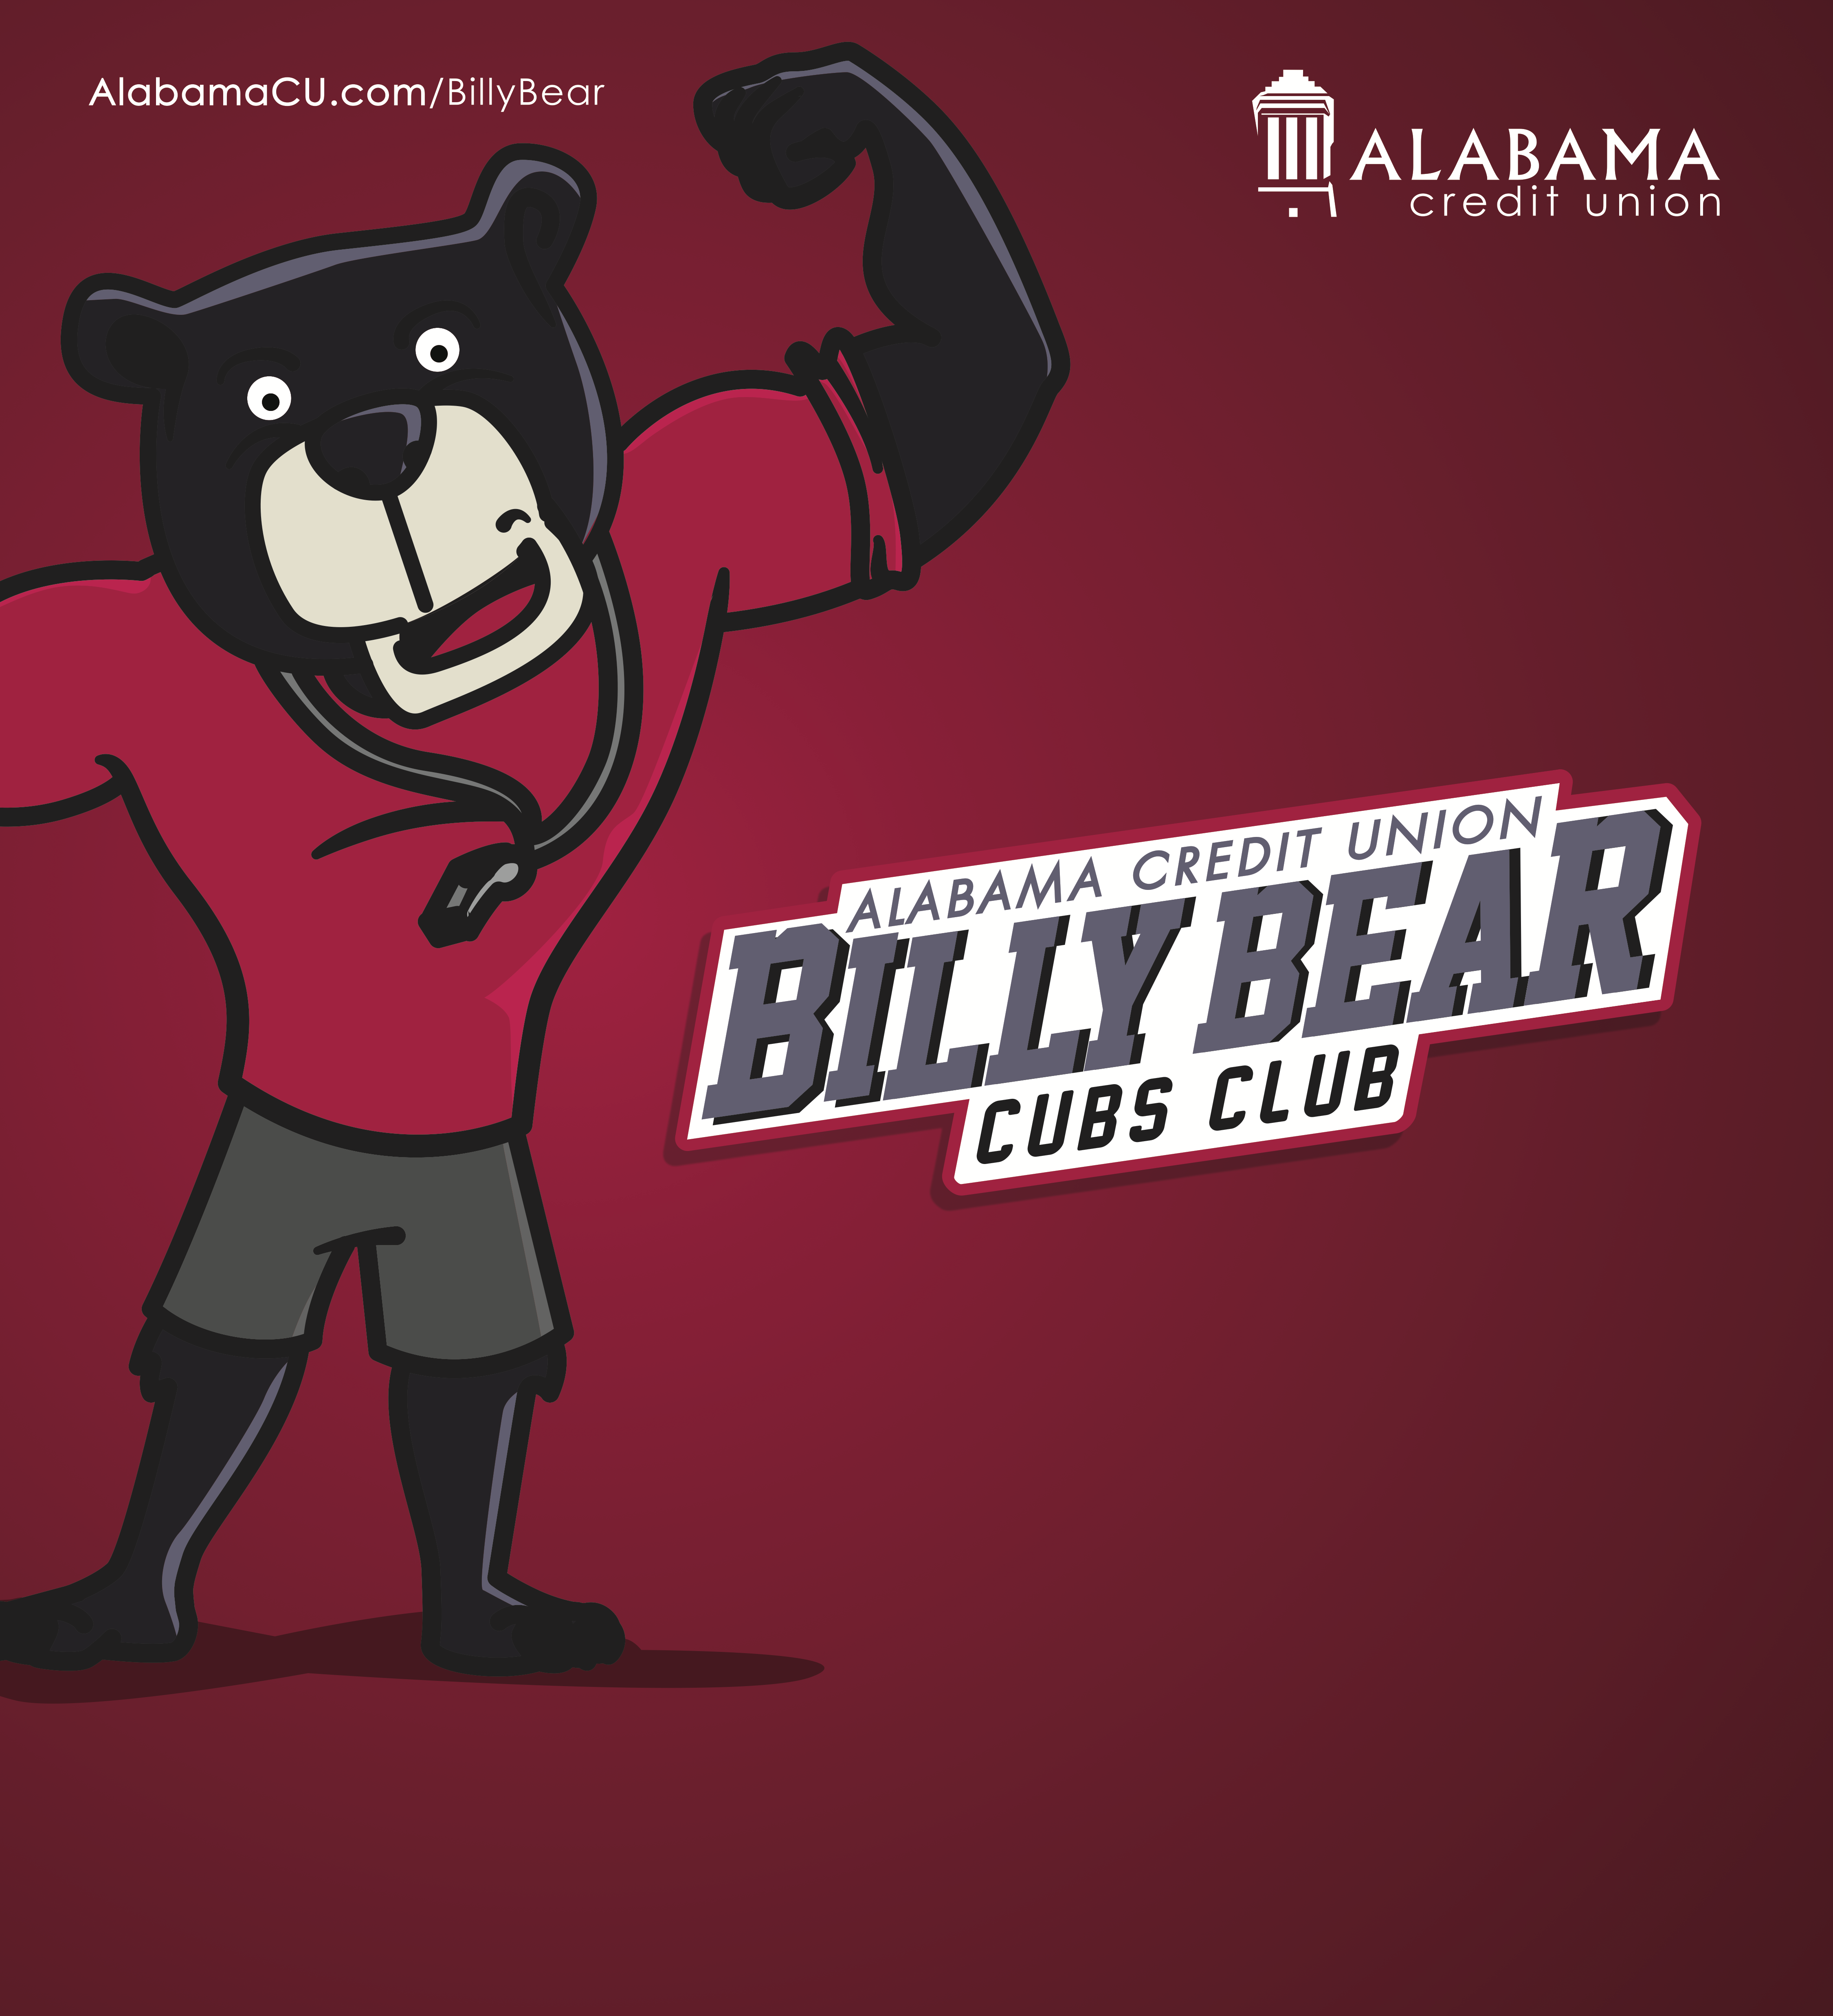 ACU Home - Alabama Credit Union